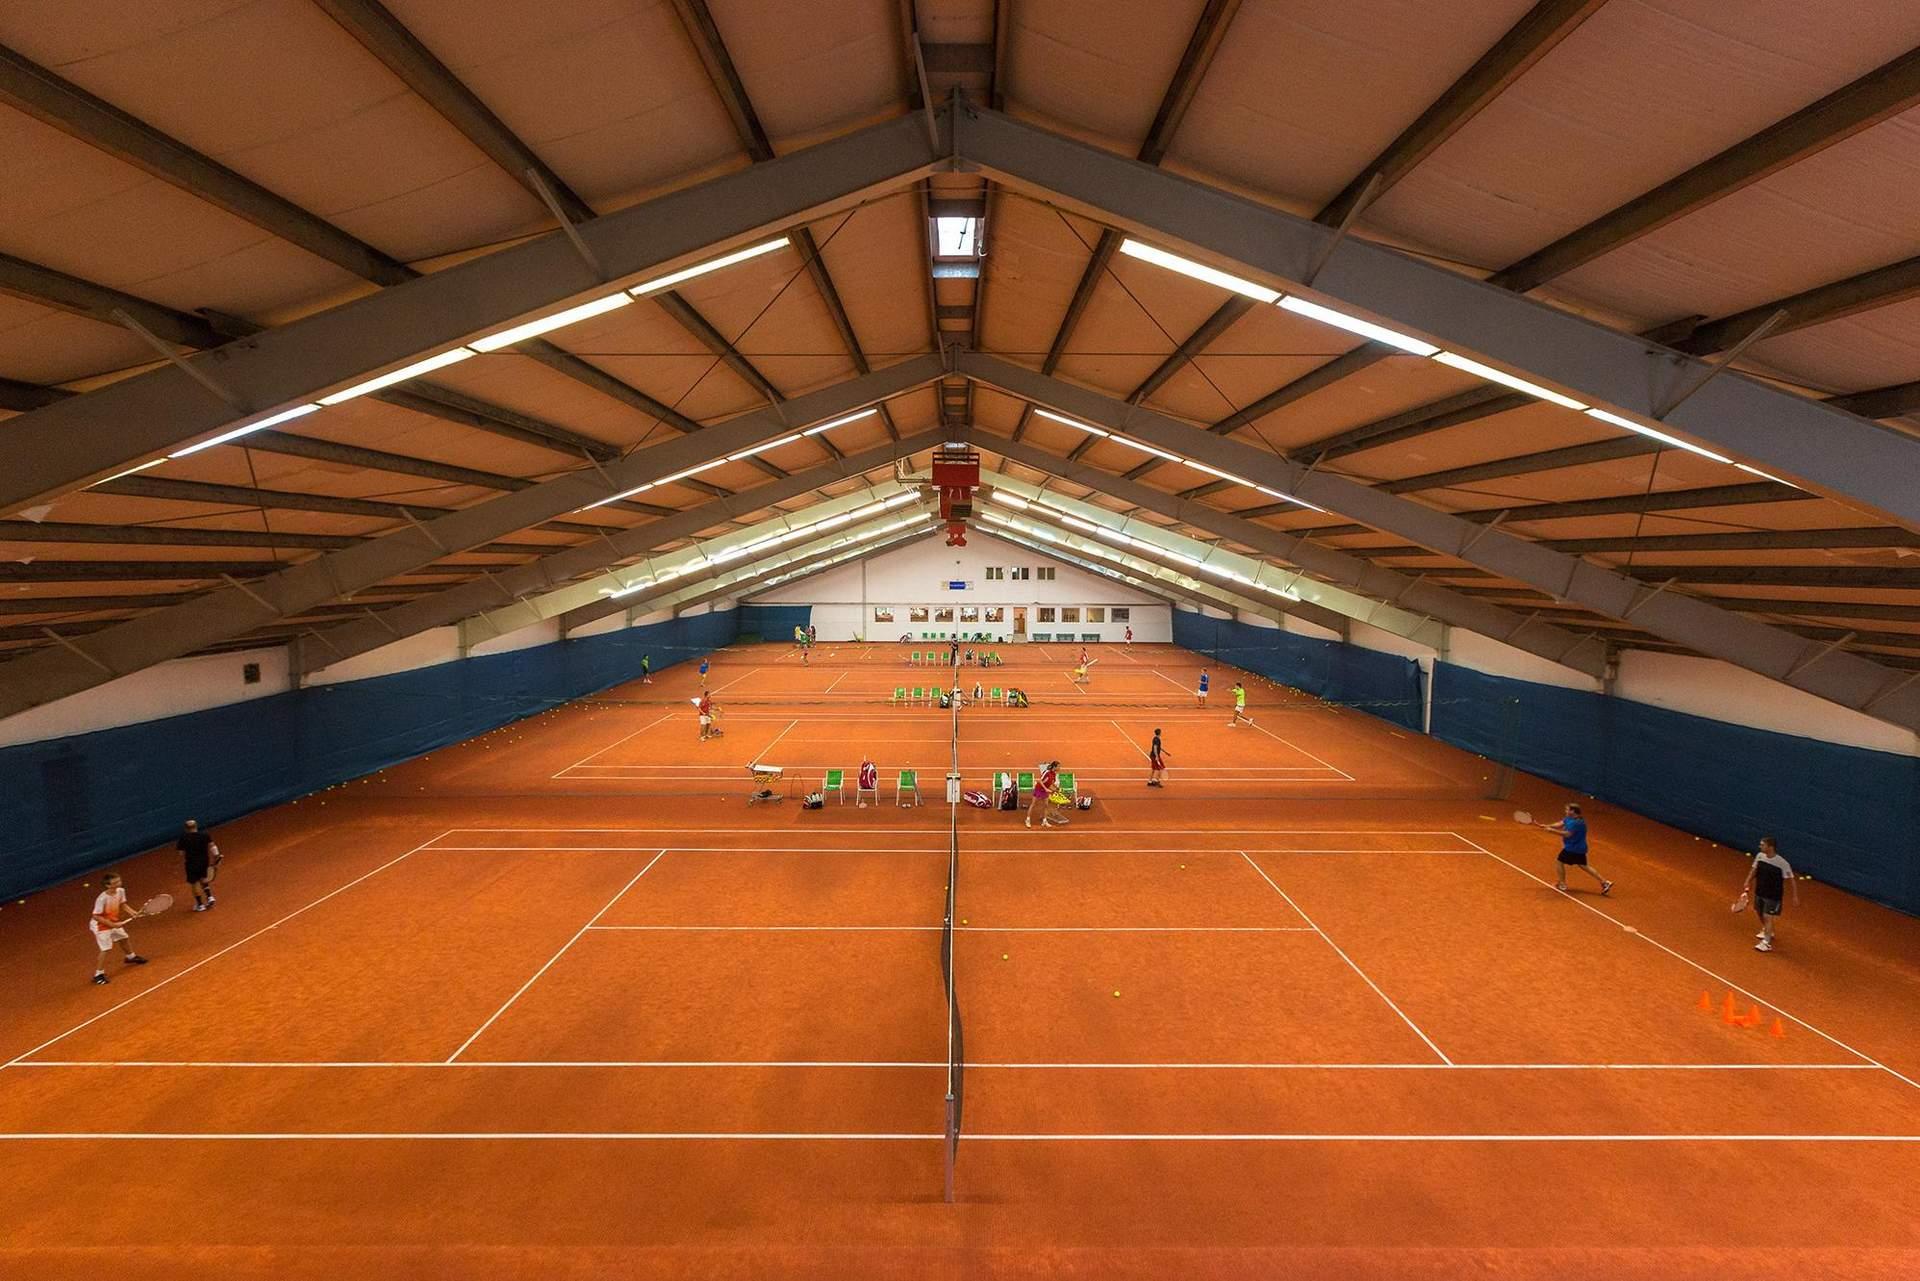 Tennishalle Sporthotel Kurz